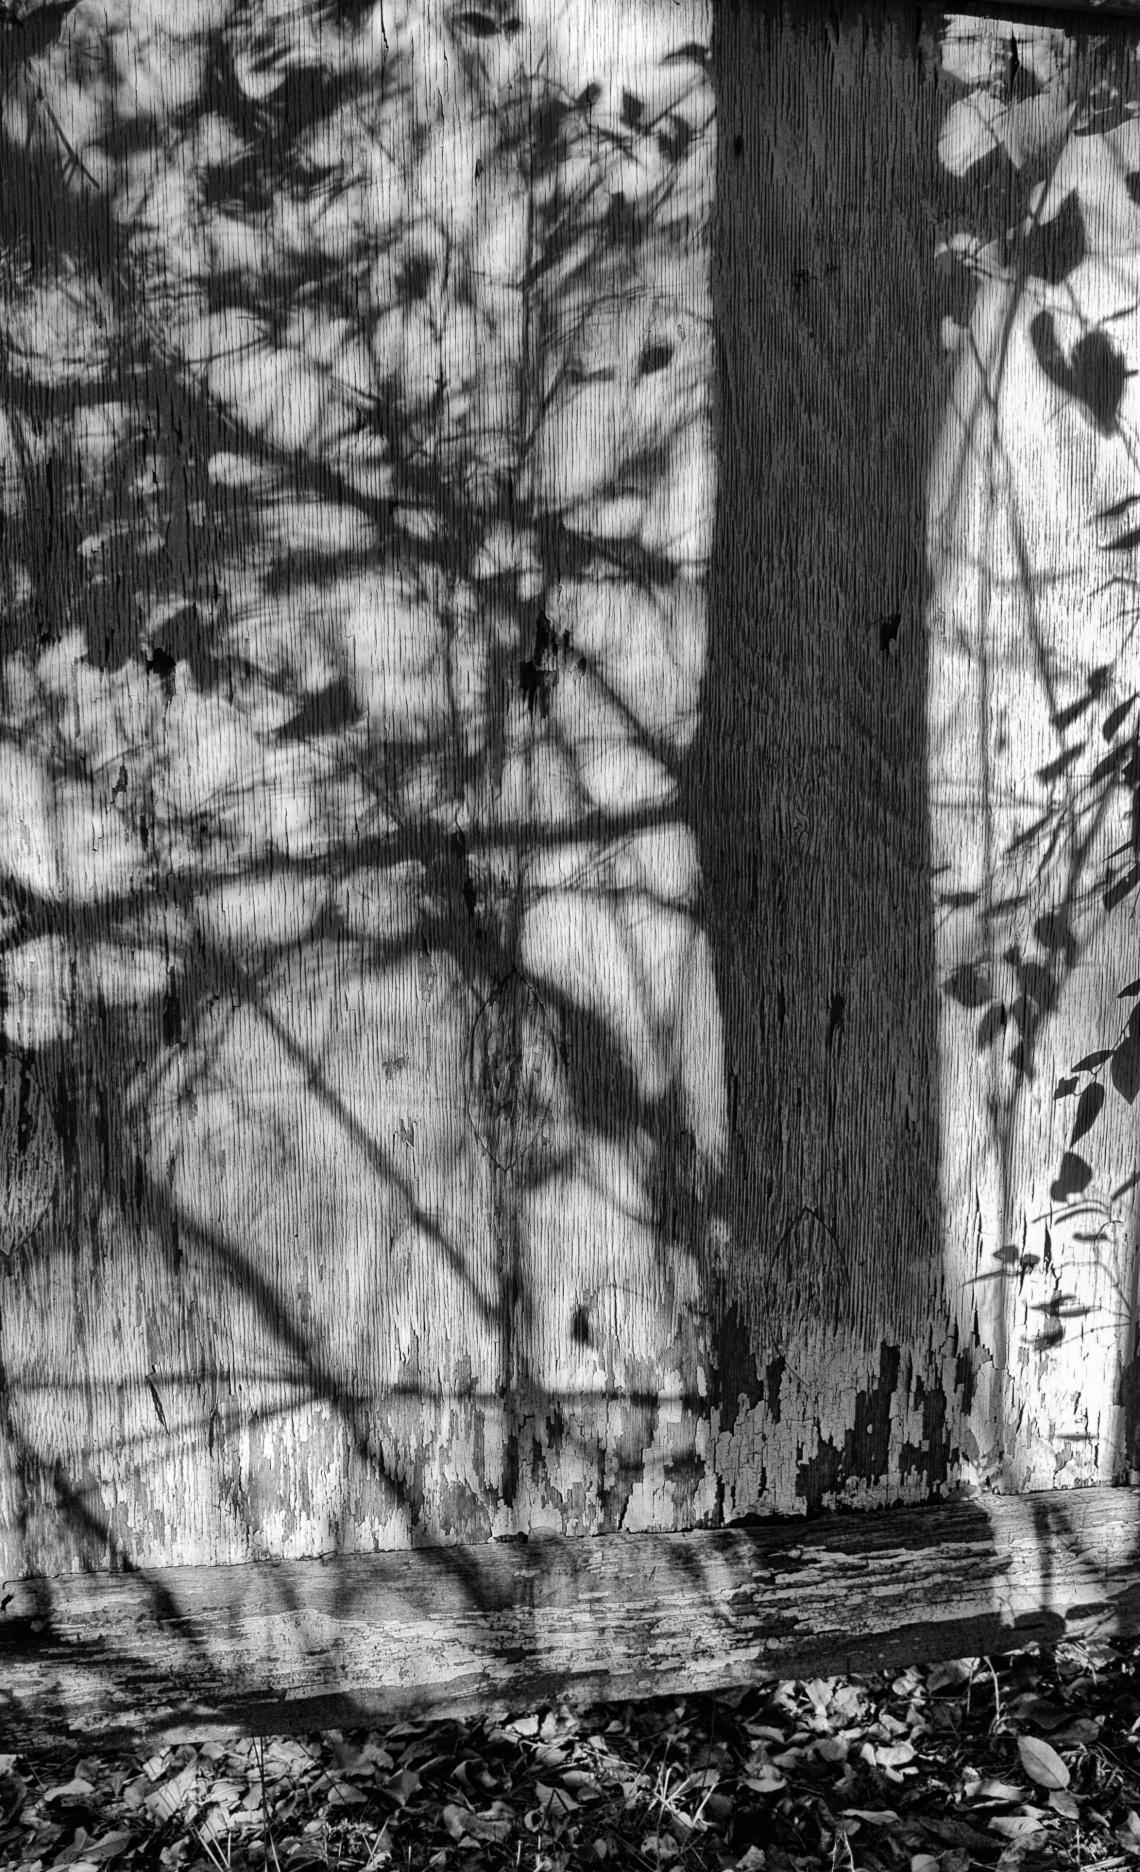 Late afternoon sun casts shadows on old barn door.